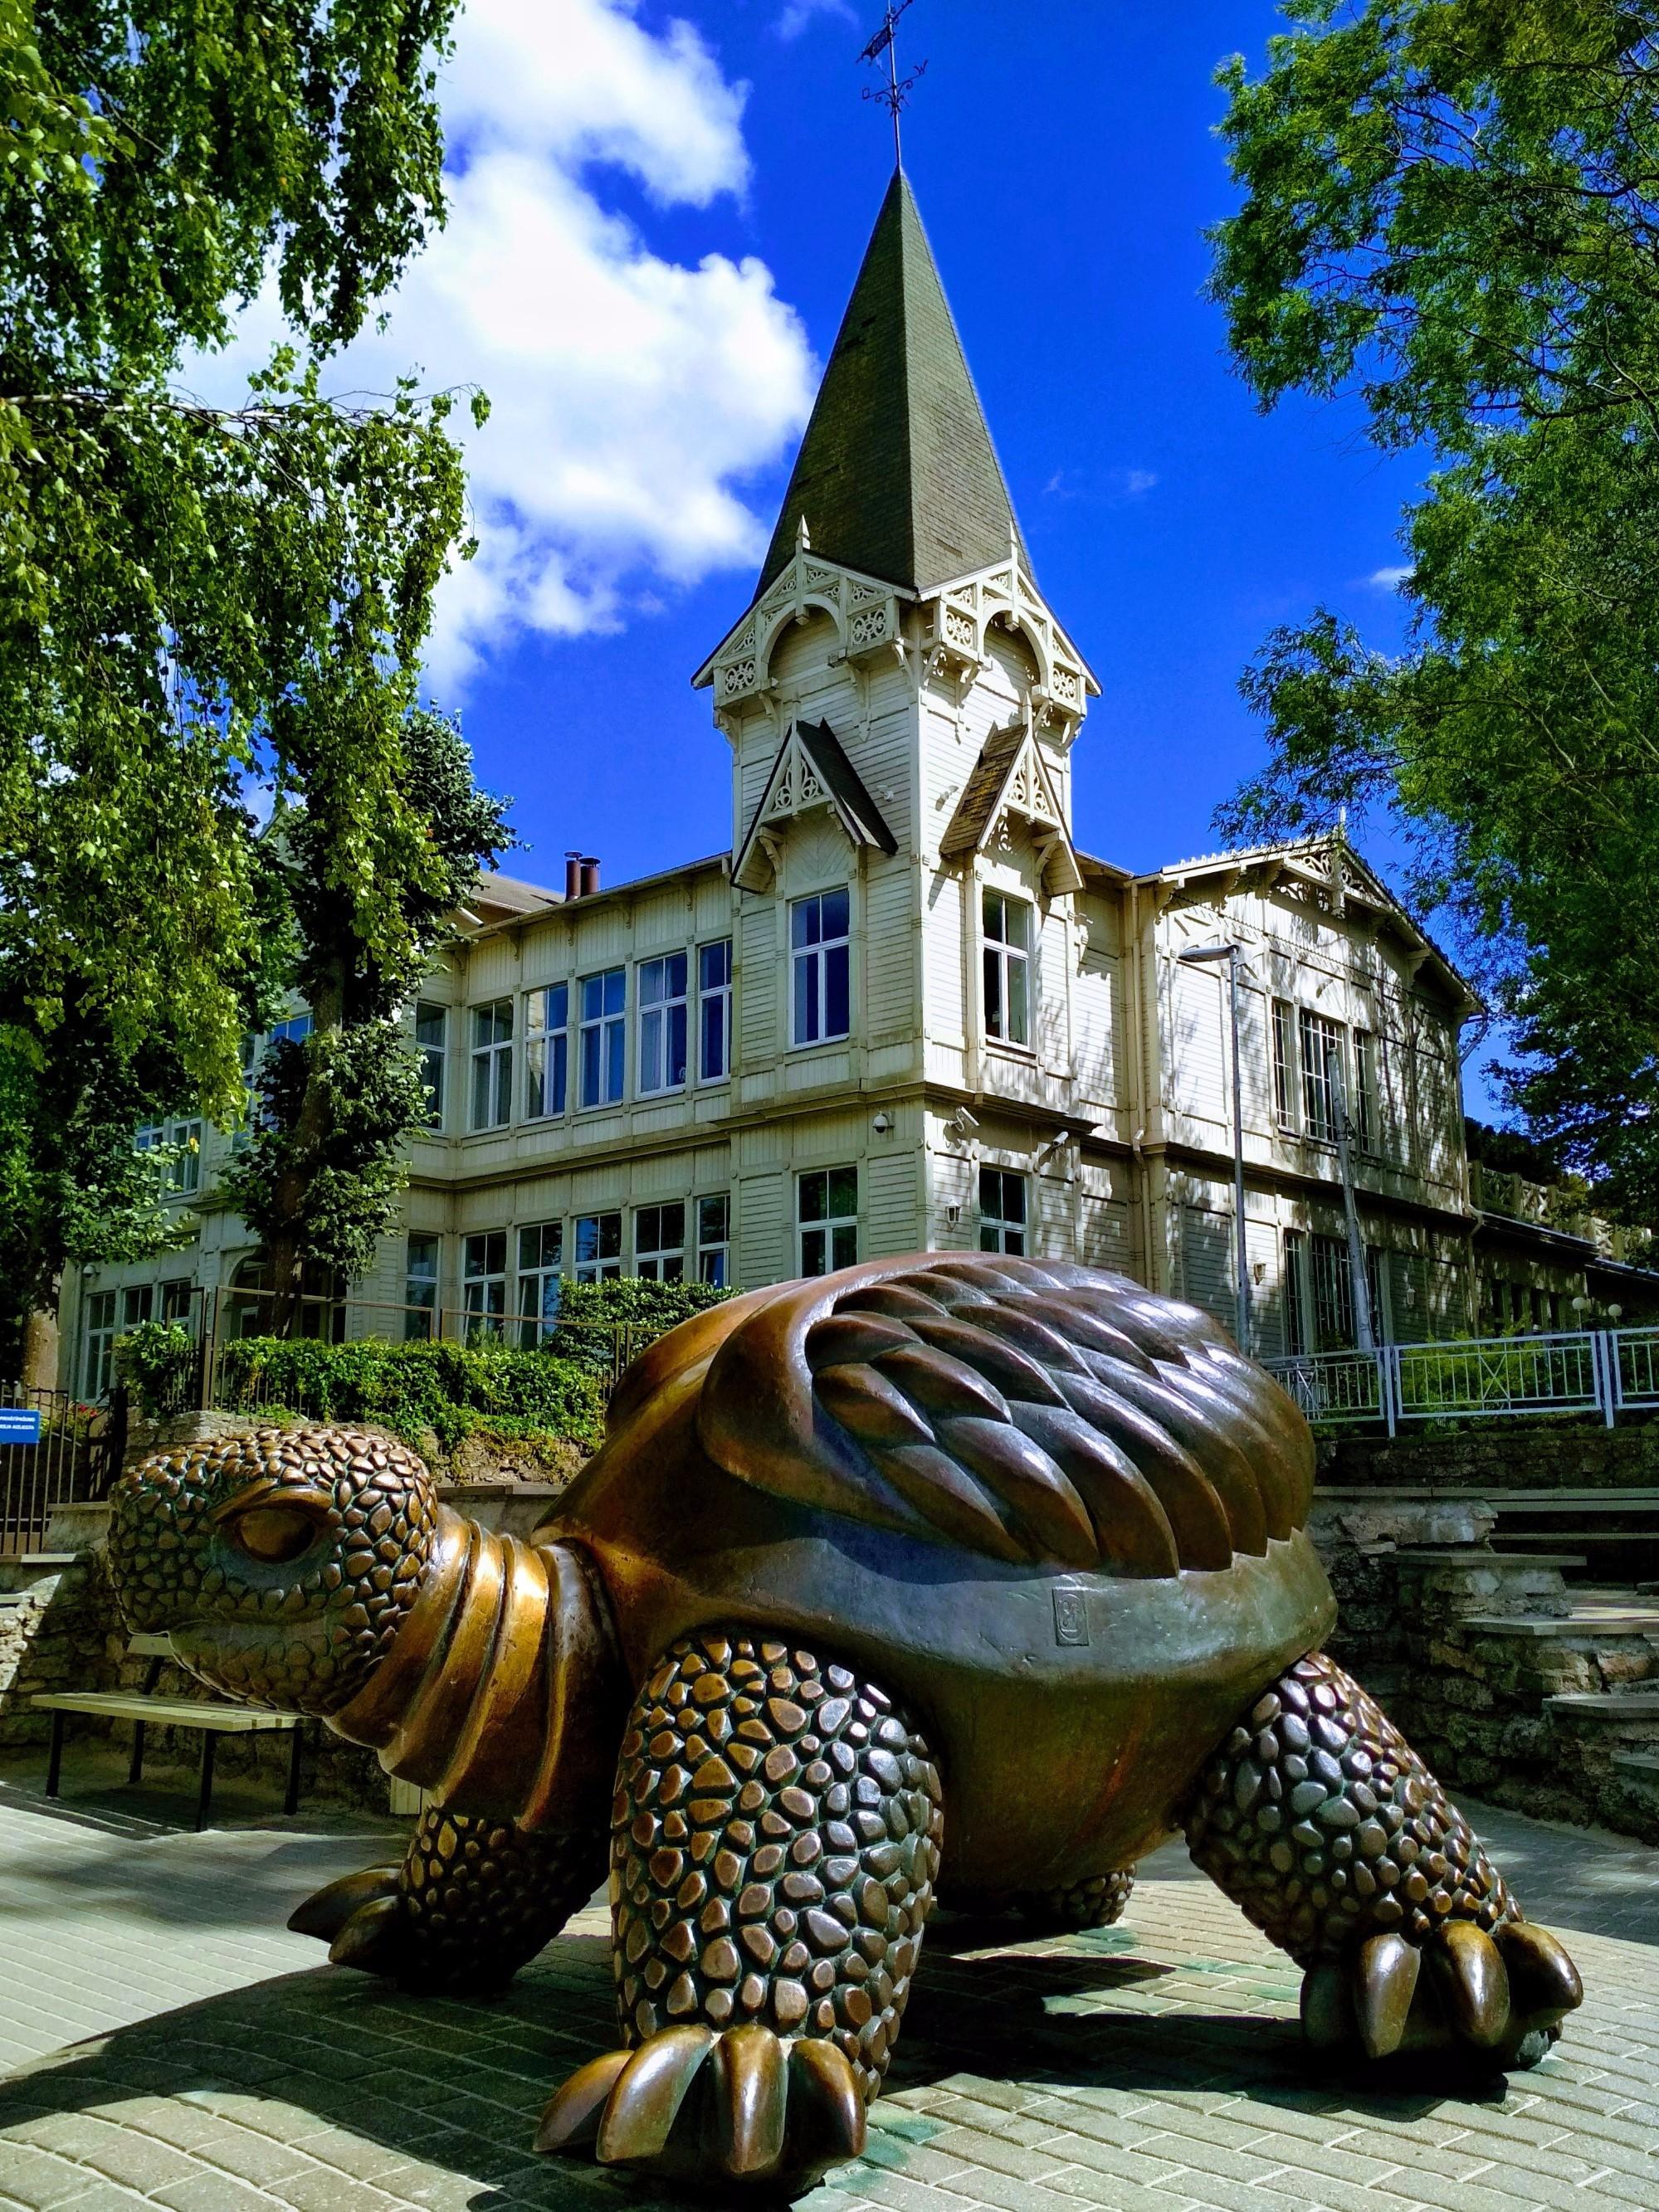 кузбасском институте город юрмала латвия фото полочка винтажном стиле